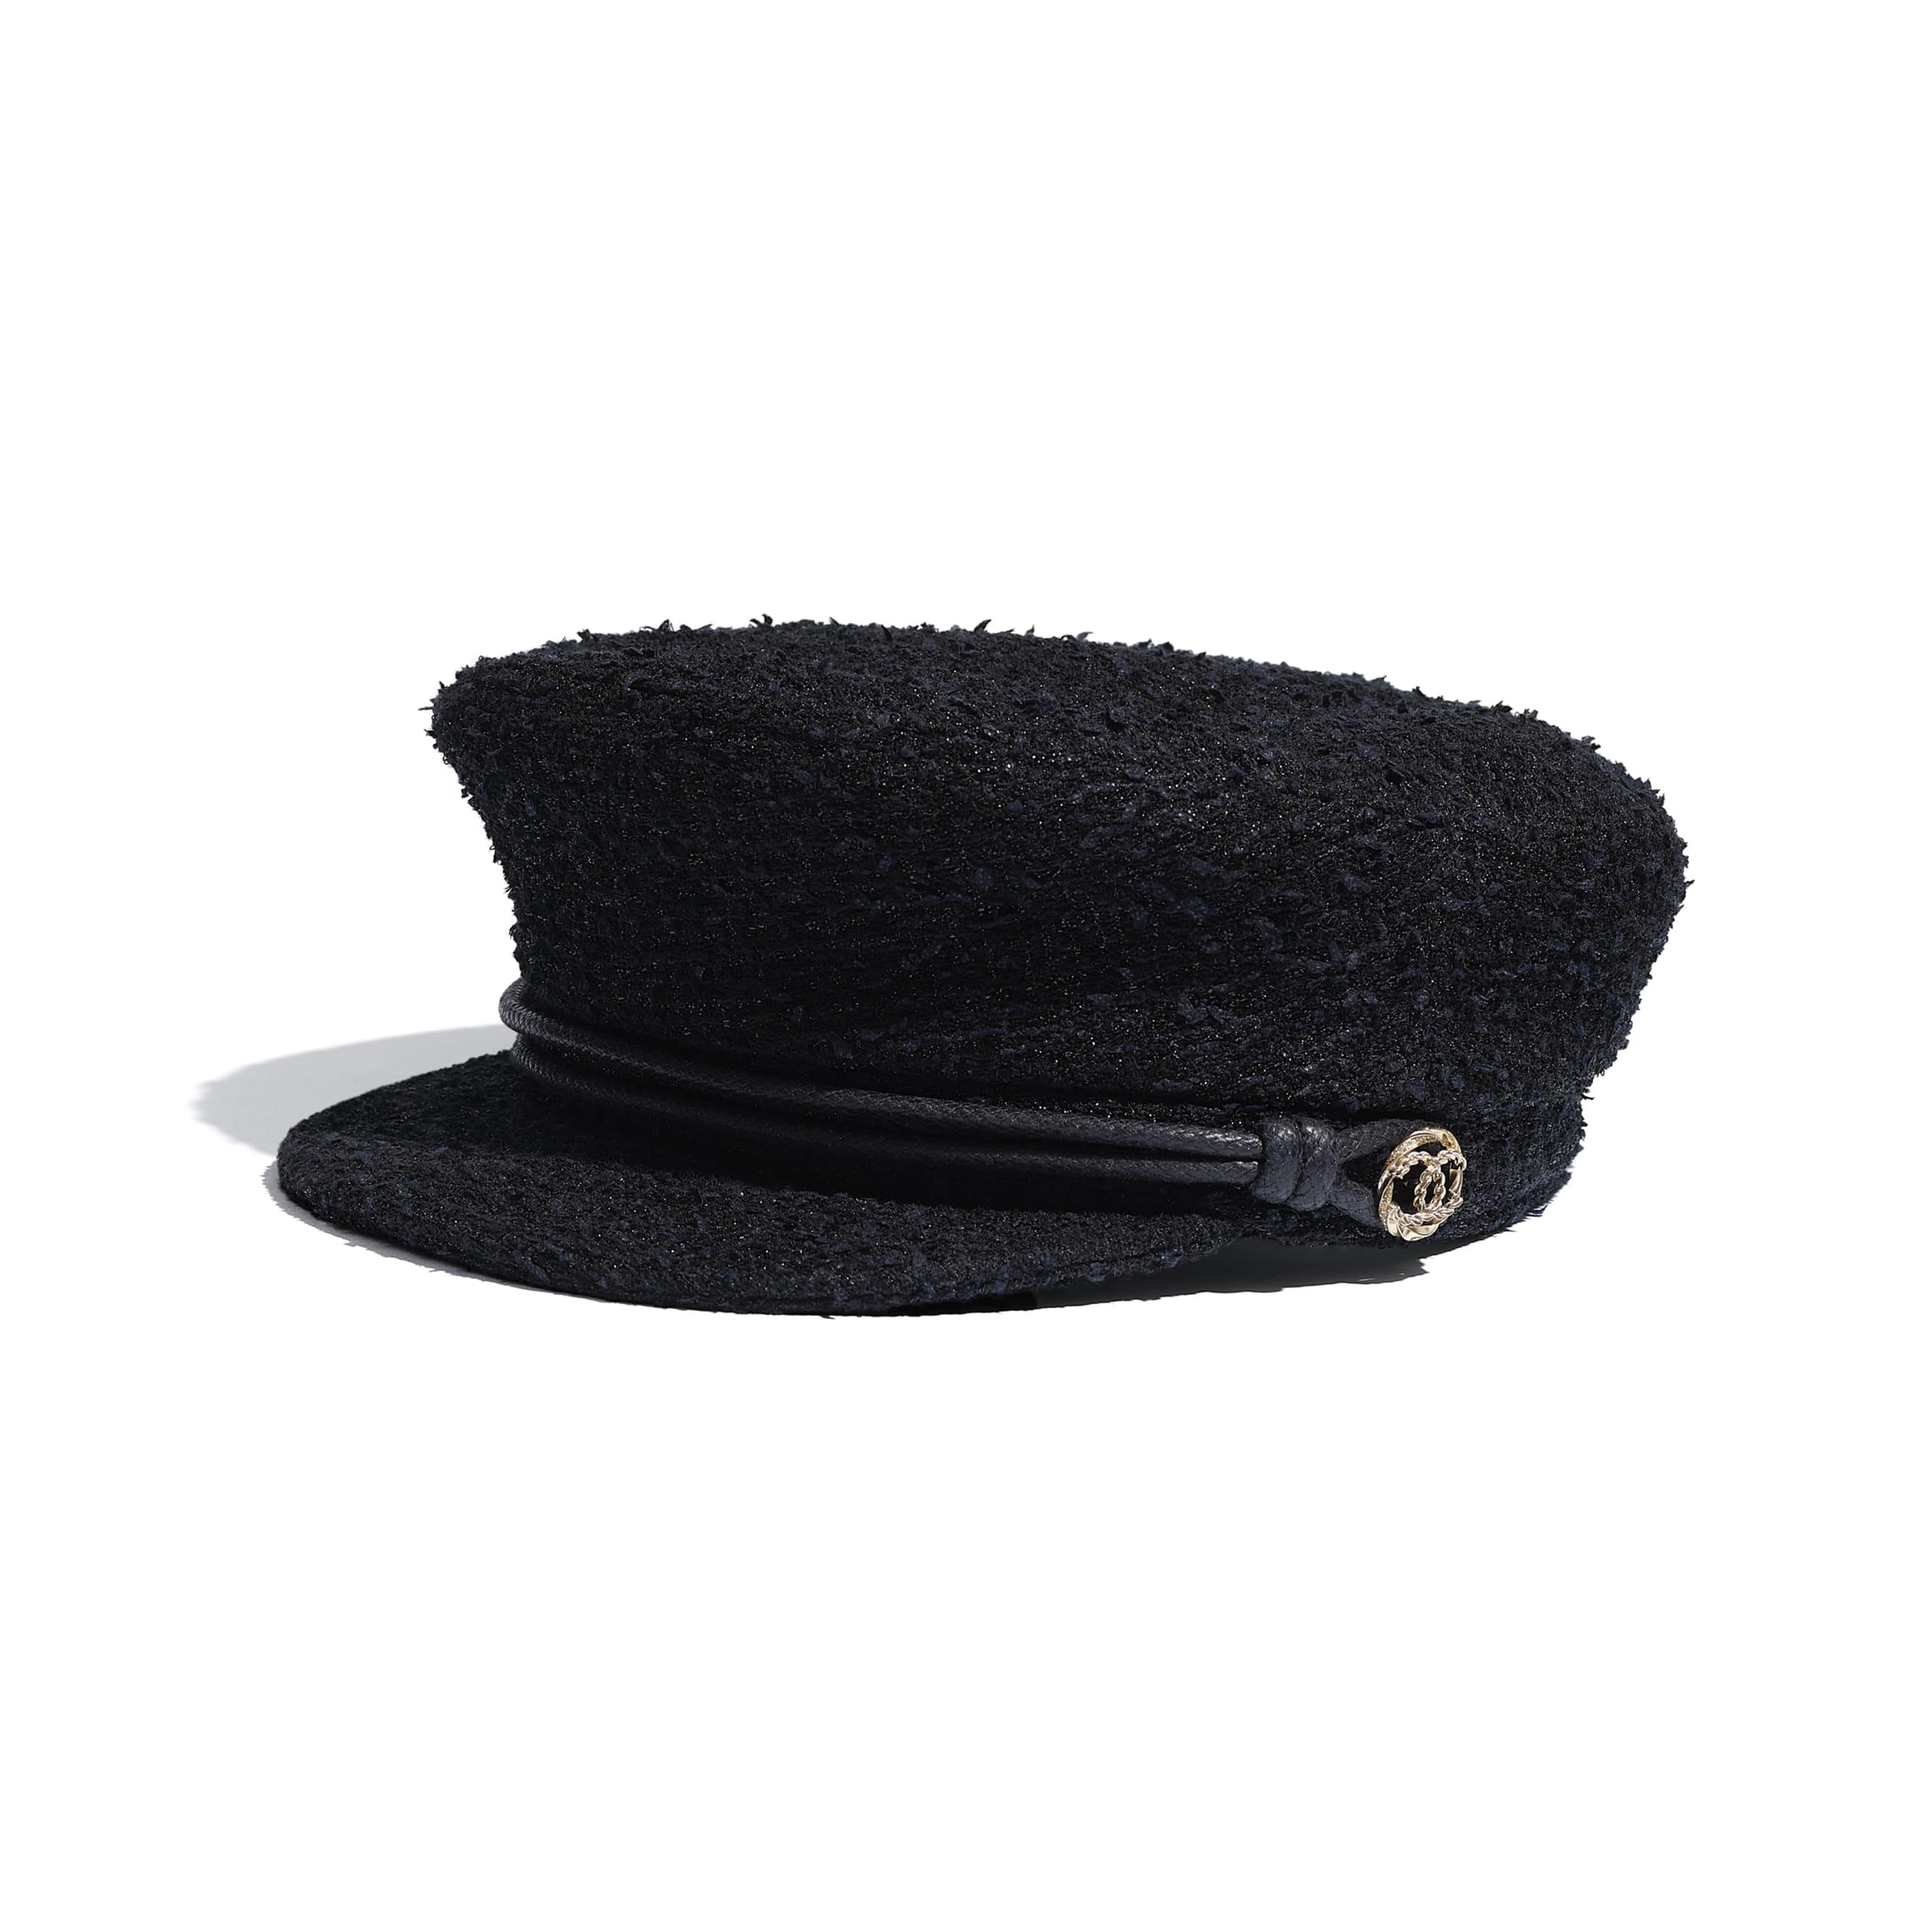 Sailor Cap - Black - Tweed & Metal - CHANEL - Default view - see standard sized version